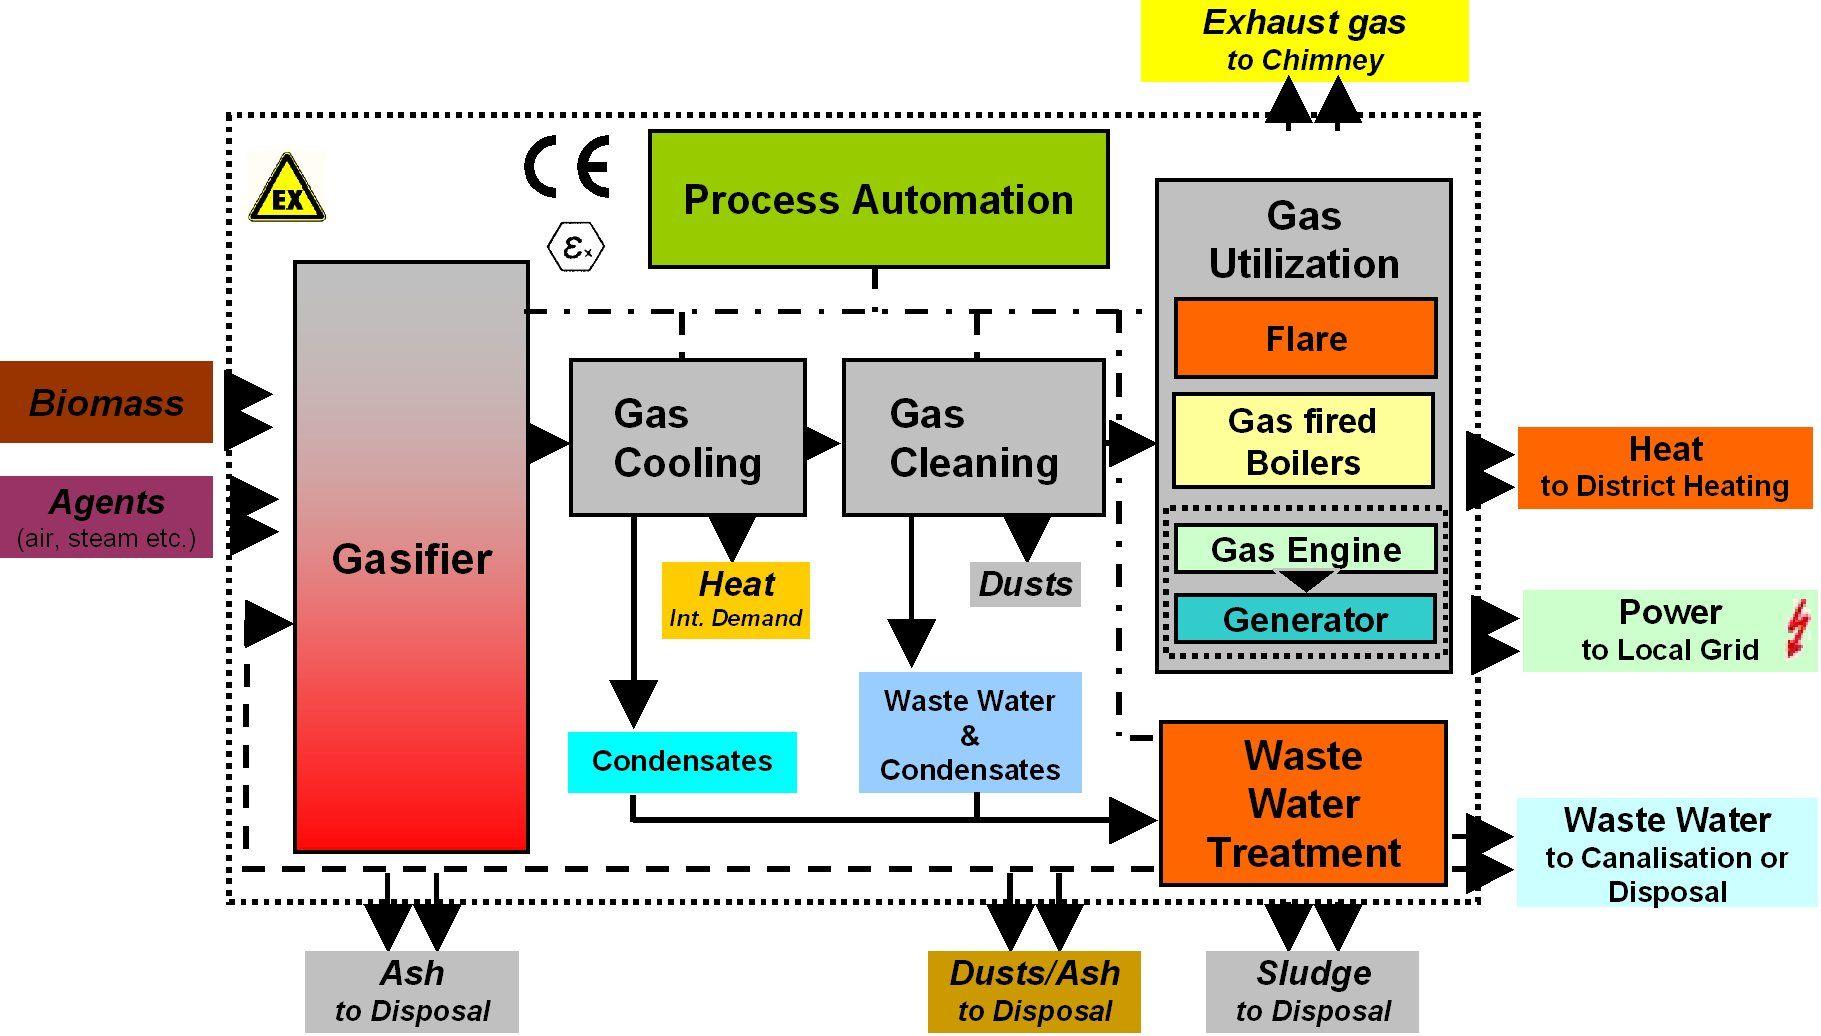 layout of biomass gasification plant [ 1821 x 1036 Pixel ]